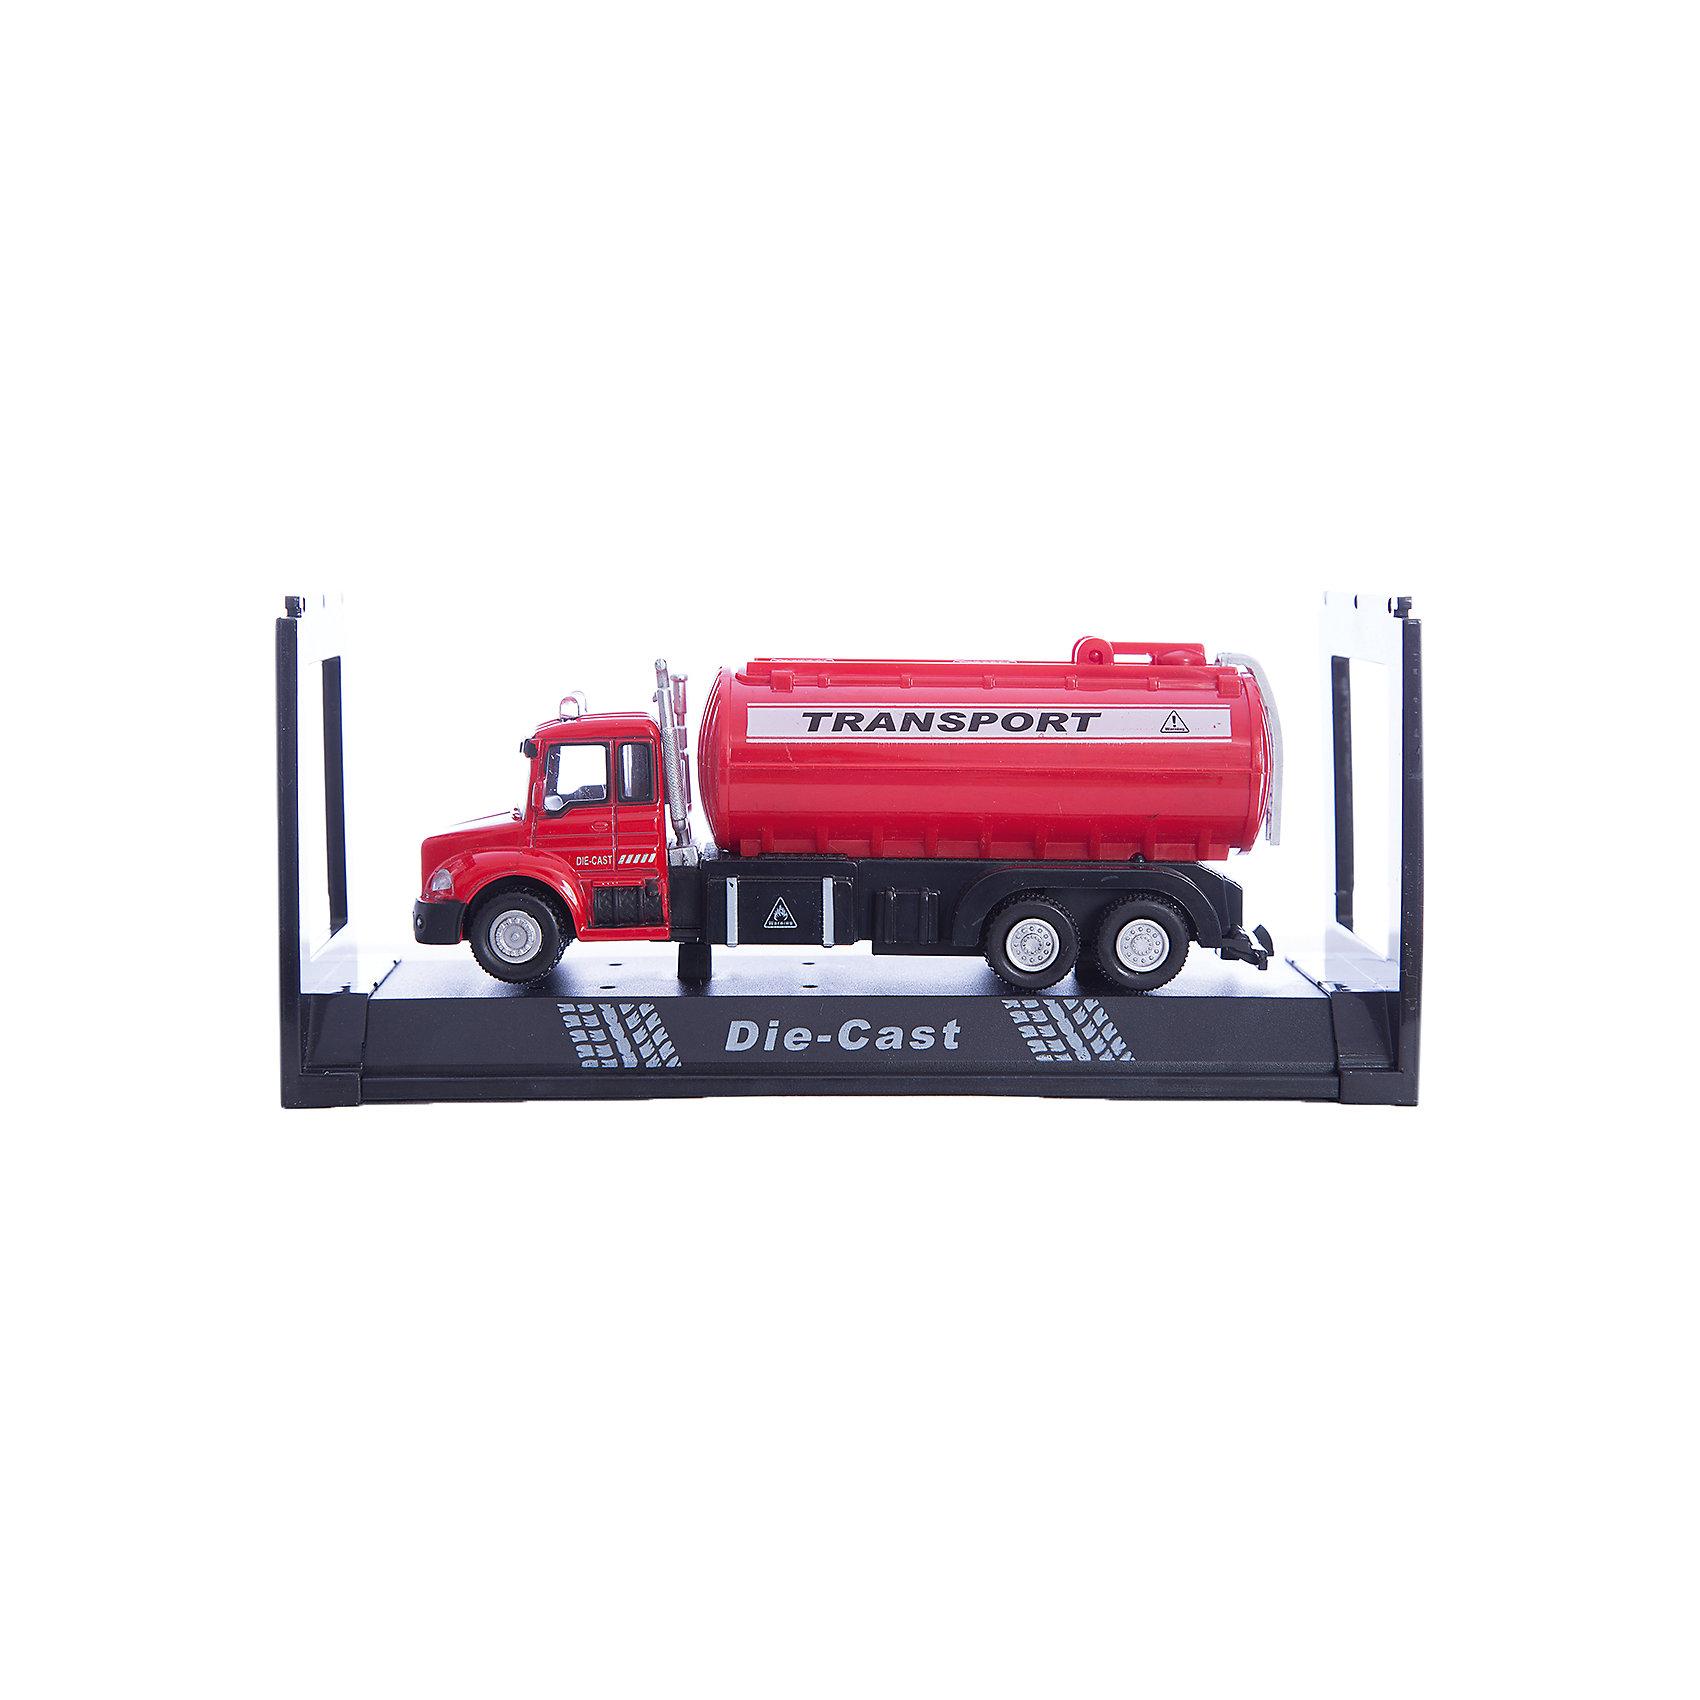 Машинка Tank Wagon Truck цистерна 1:48, AutotimeМашинки<br><br><br>Ширина мм: 165<br>Глубина мм: 57<br>Высота мм: 75<br>Вес г: 13<br>Возраст от месяцев: 36<br>Возраст до месяцев: 2147483647<br>Пол: Мужской<br>Возраст: Детский<br>SKU: 5584054